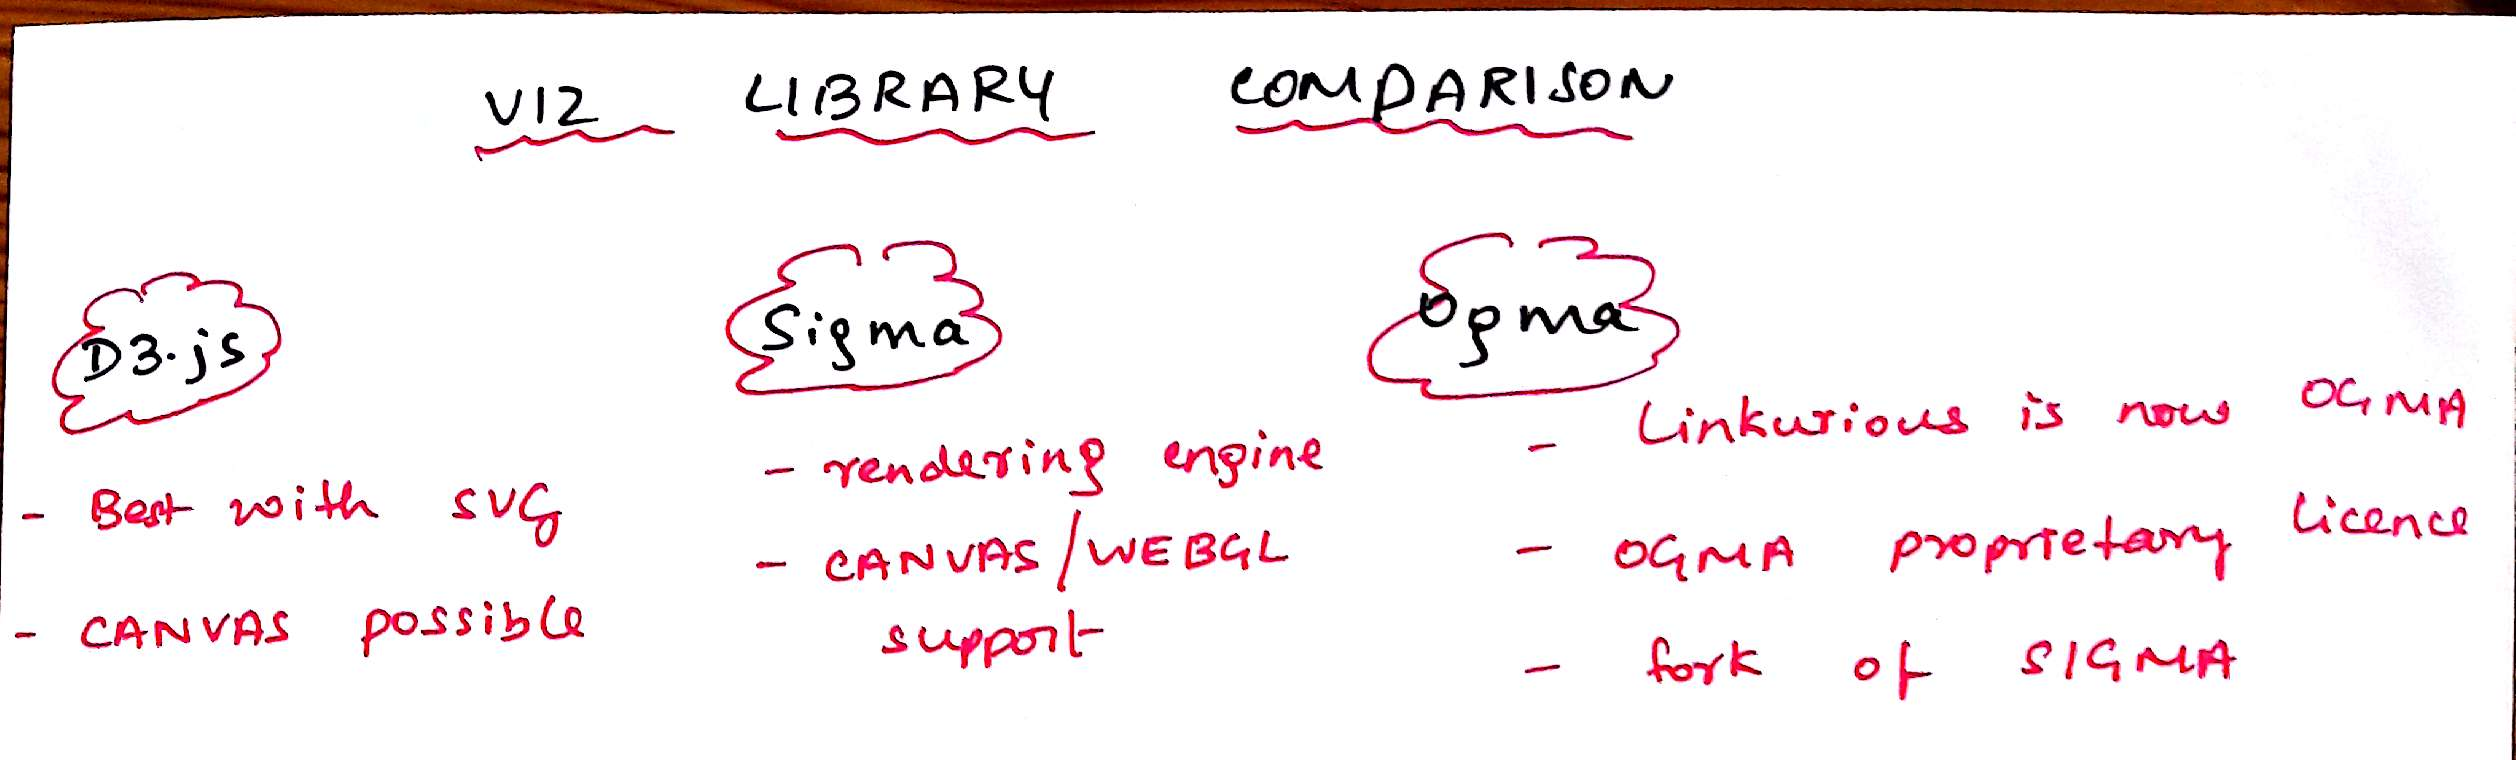 viz-lib-comparison